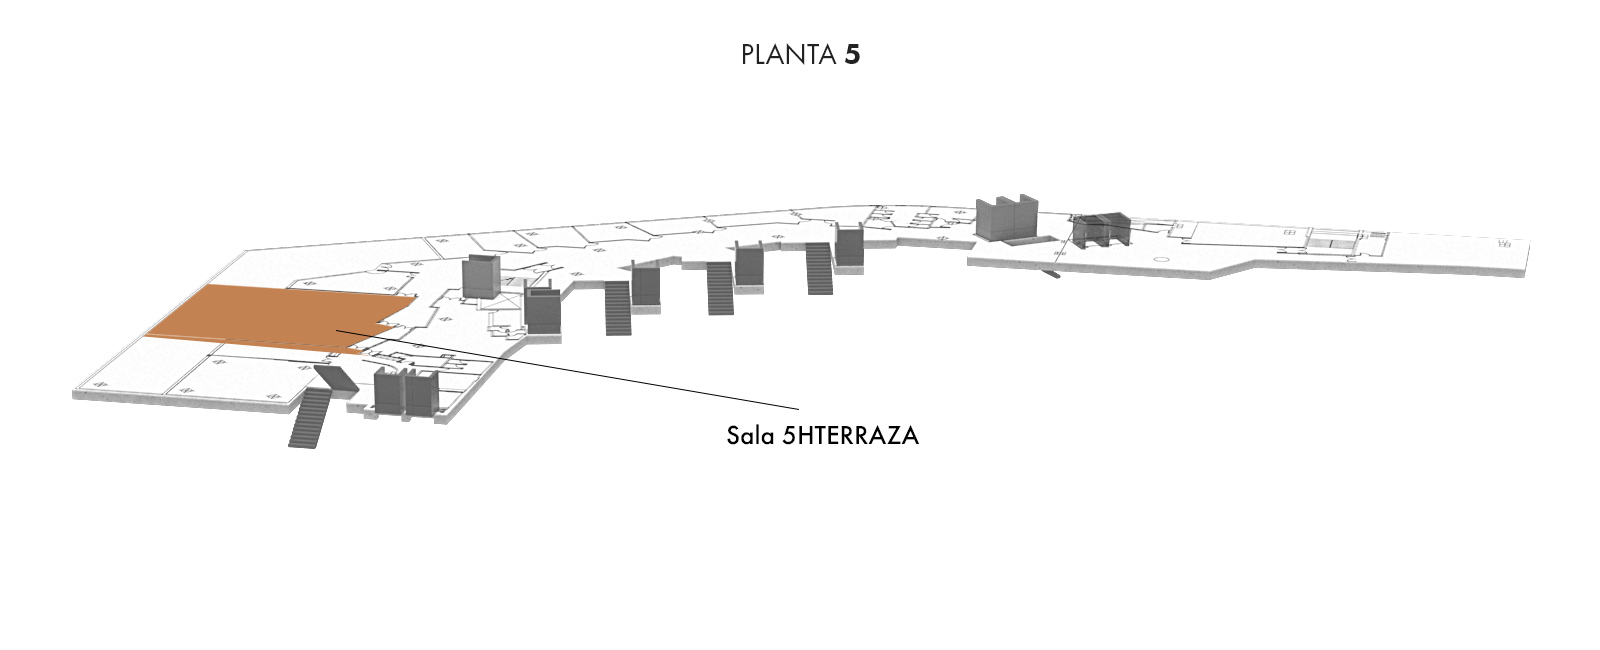 Sala 5HTERRAZA, Planta 5 | Palacio Euskalduna Jauregia